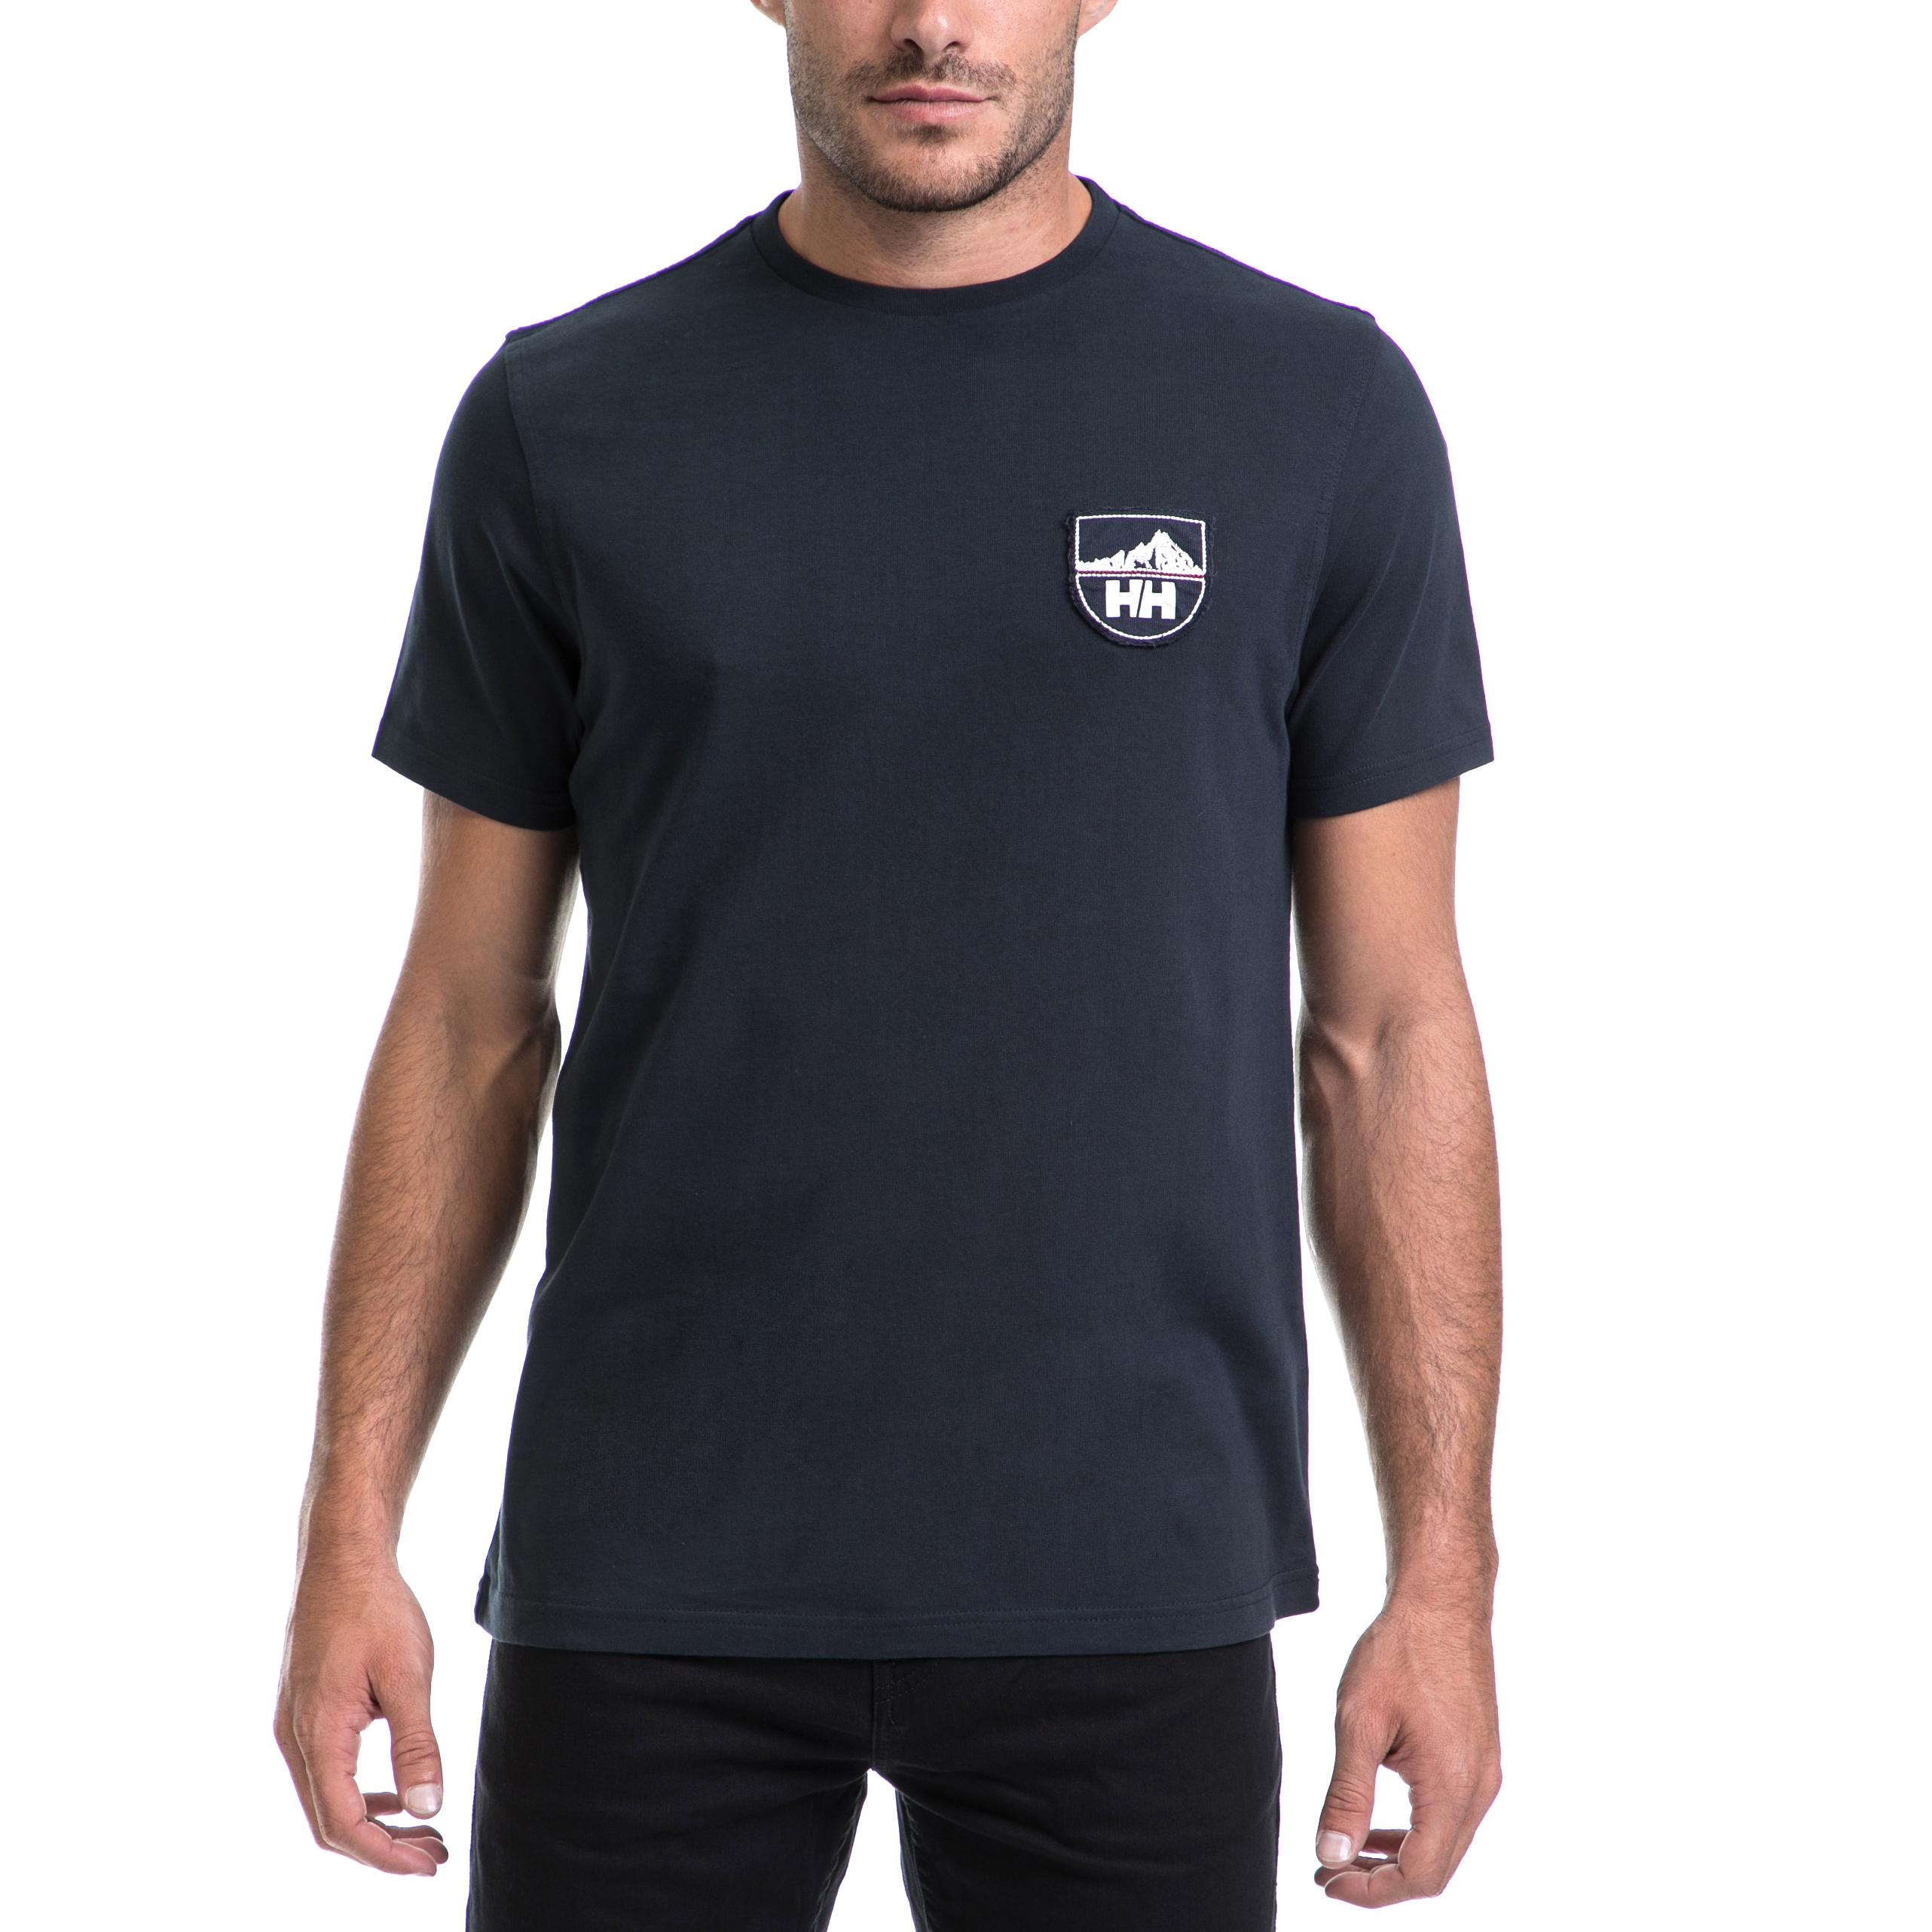 HELLY HANSEN - Αντρική μπλούζα HELLY HANSEN μπλε ανδρικά ρούχα αθλητικά t shirt